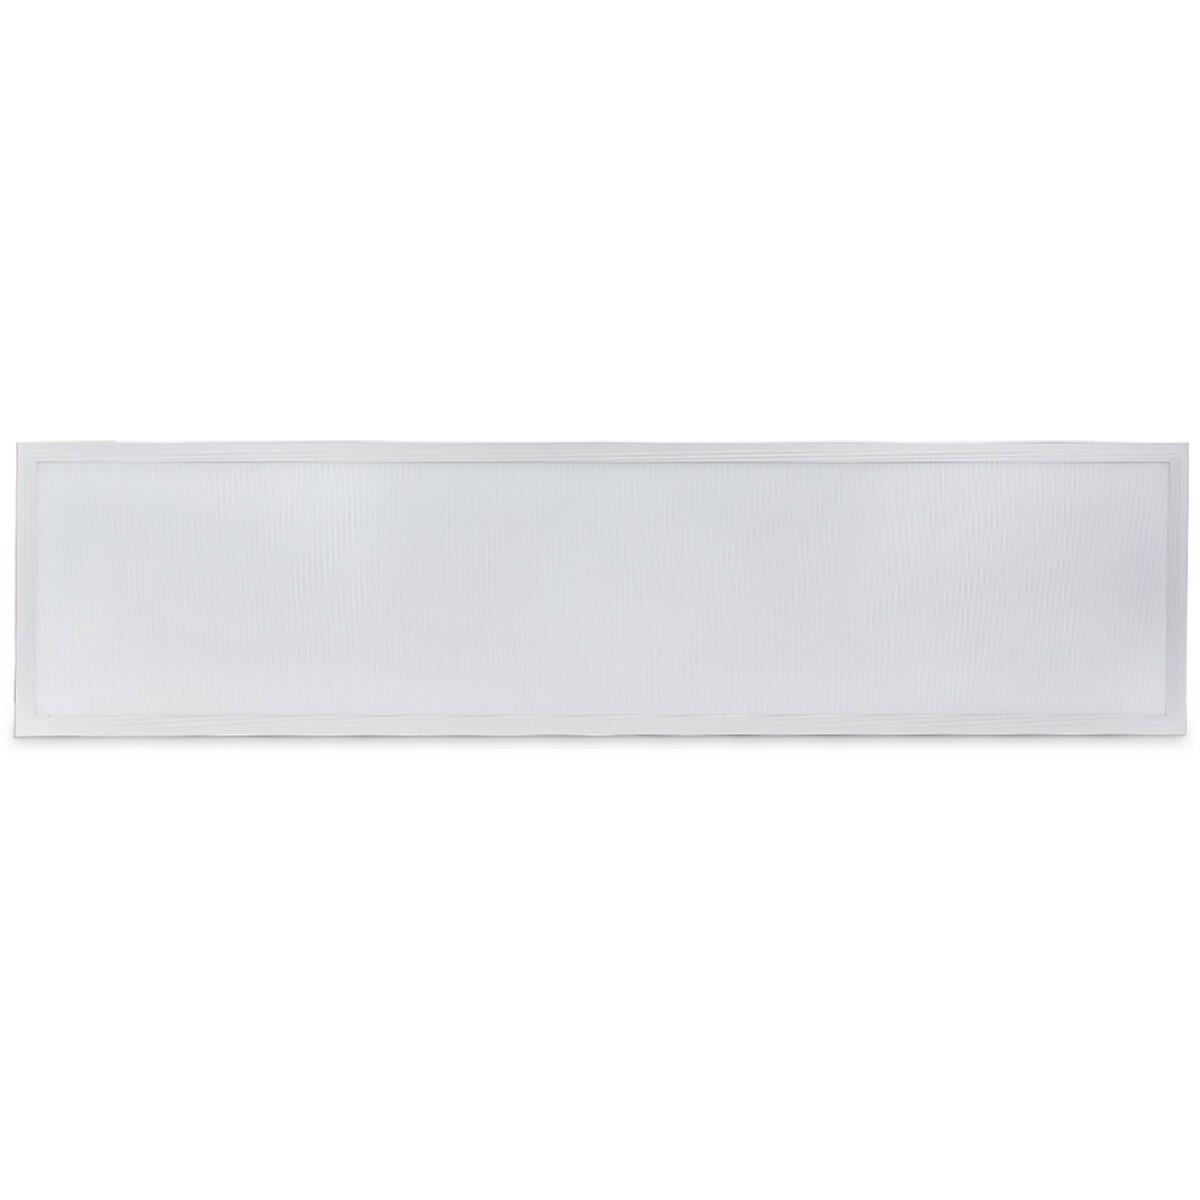 LED Paneel - Aigi Hyron - 30x120 - Aanpasbare Kleur CCT - 40W - Inbouw - Vierkant - Mat Wit - Alumin